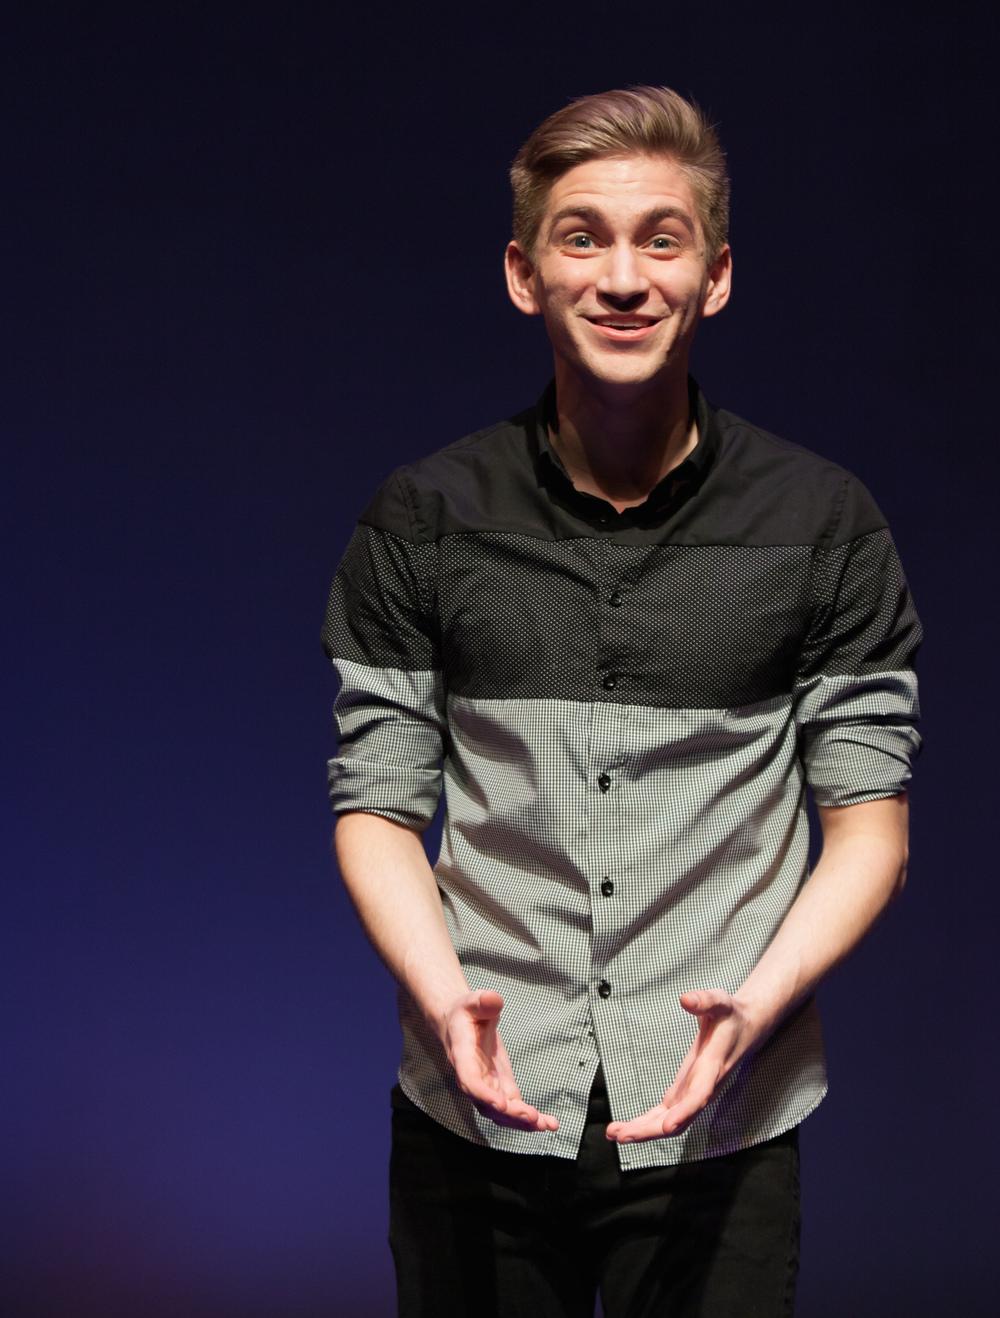 Ryan in 2014